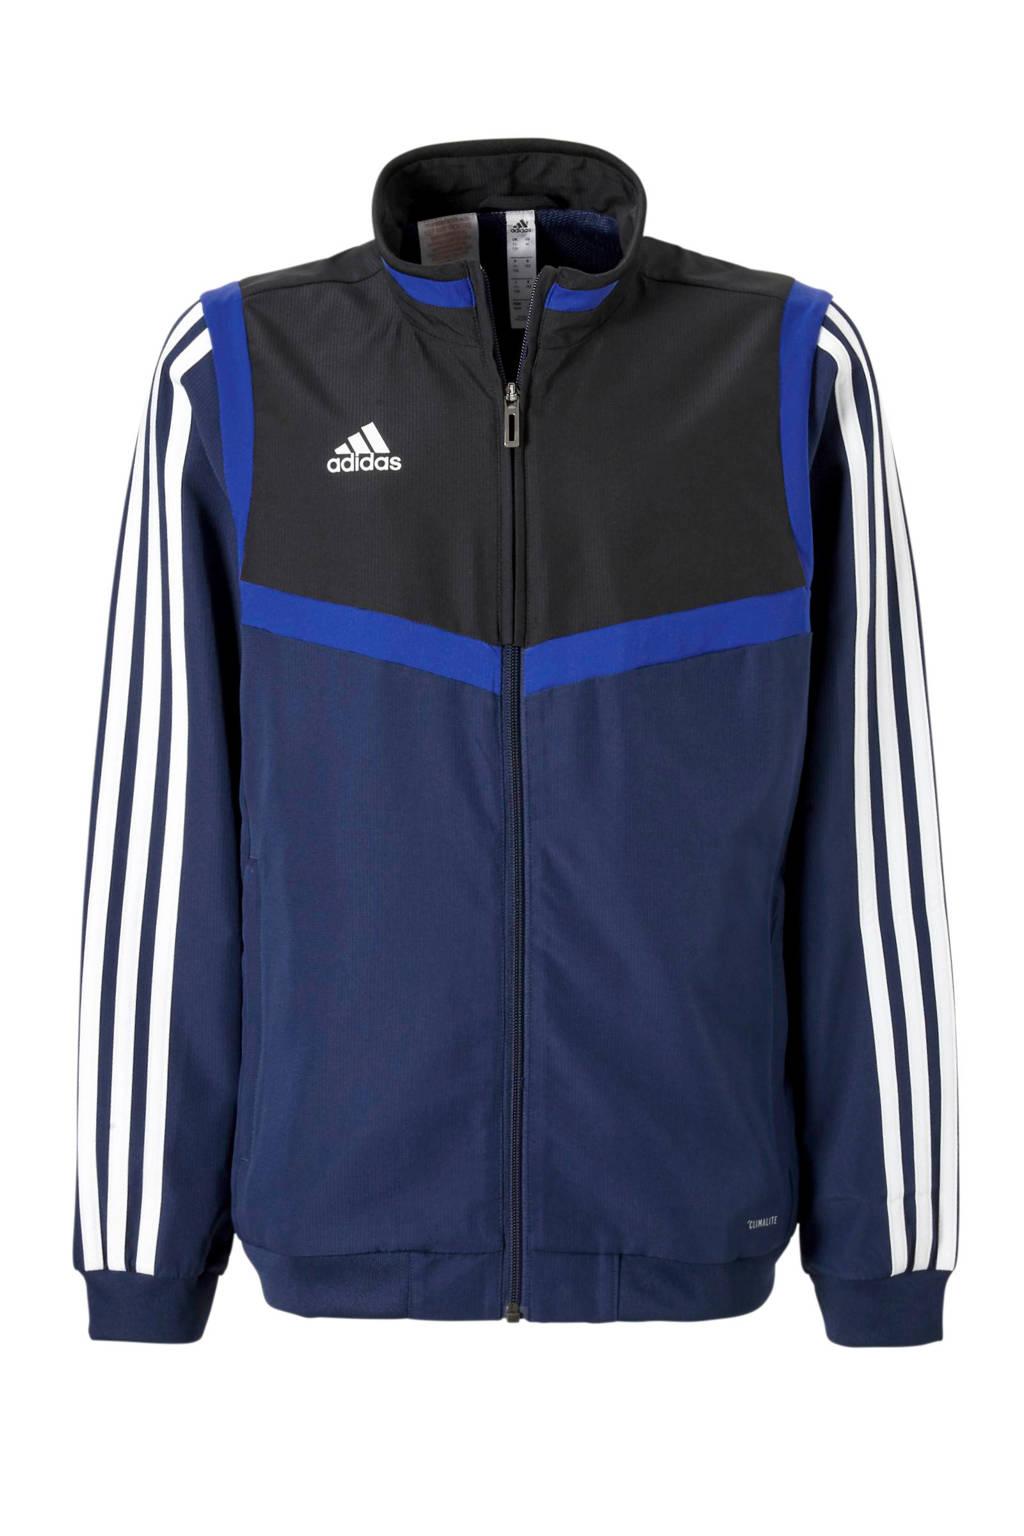 adidas performance   sportvest donkerblauw, Donkerblauw/zwart/wit